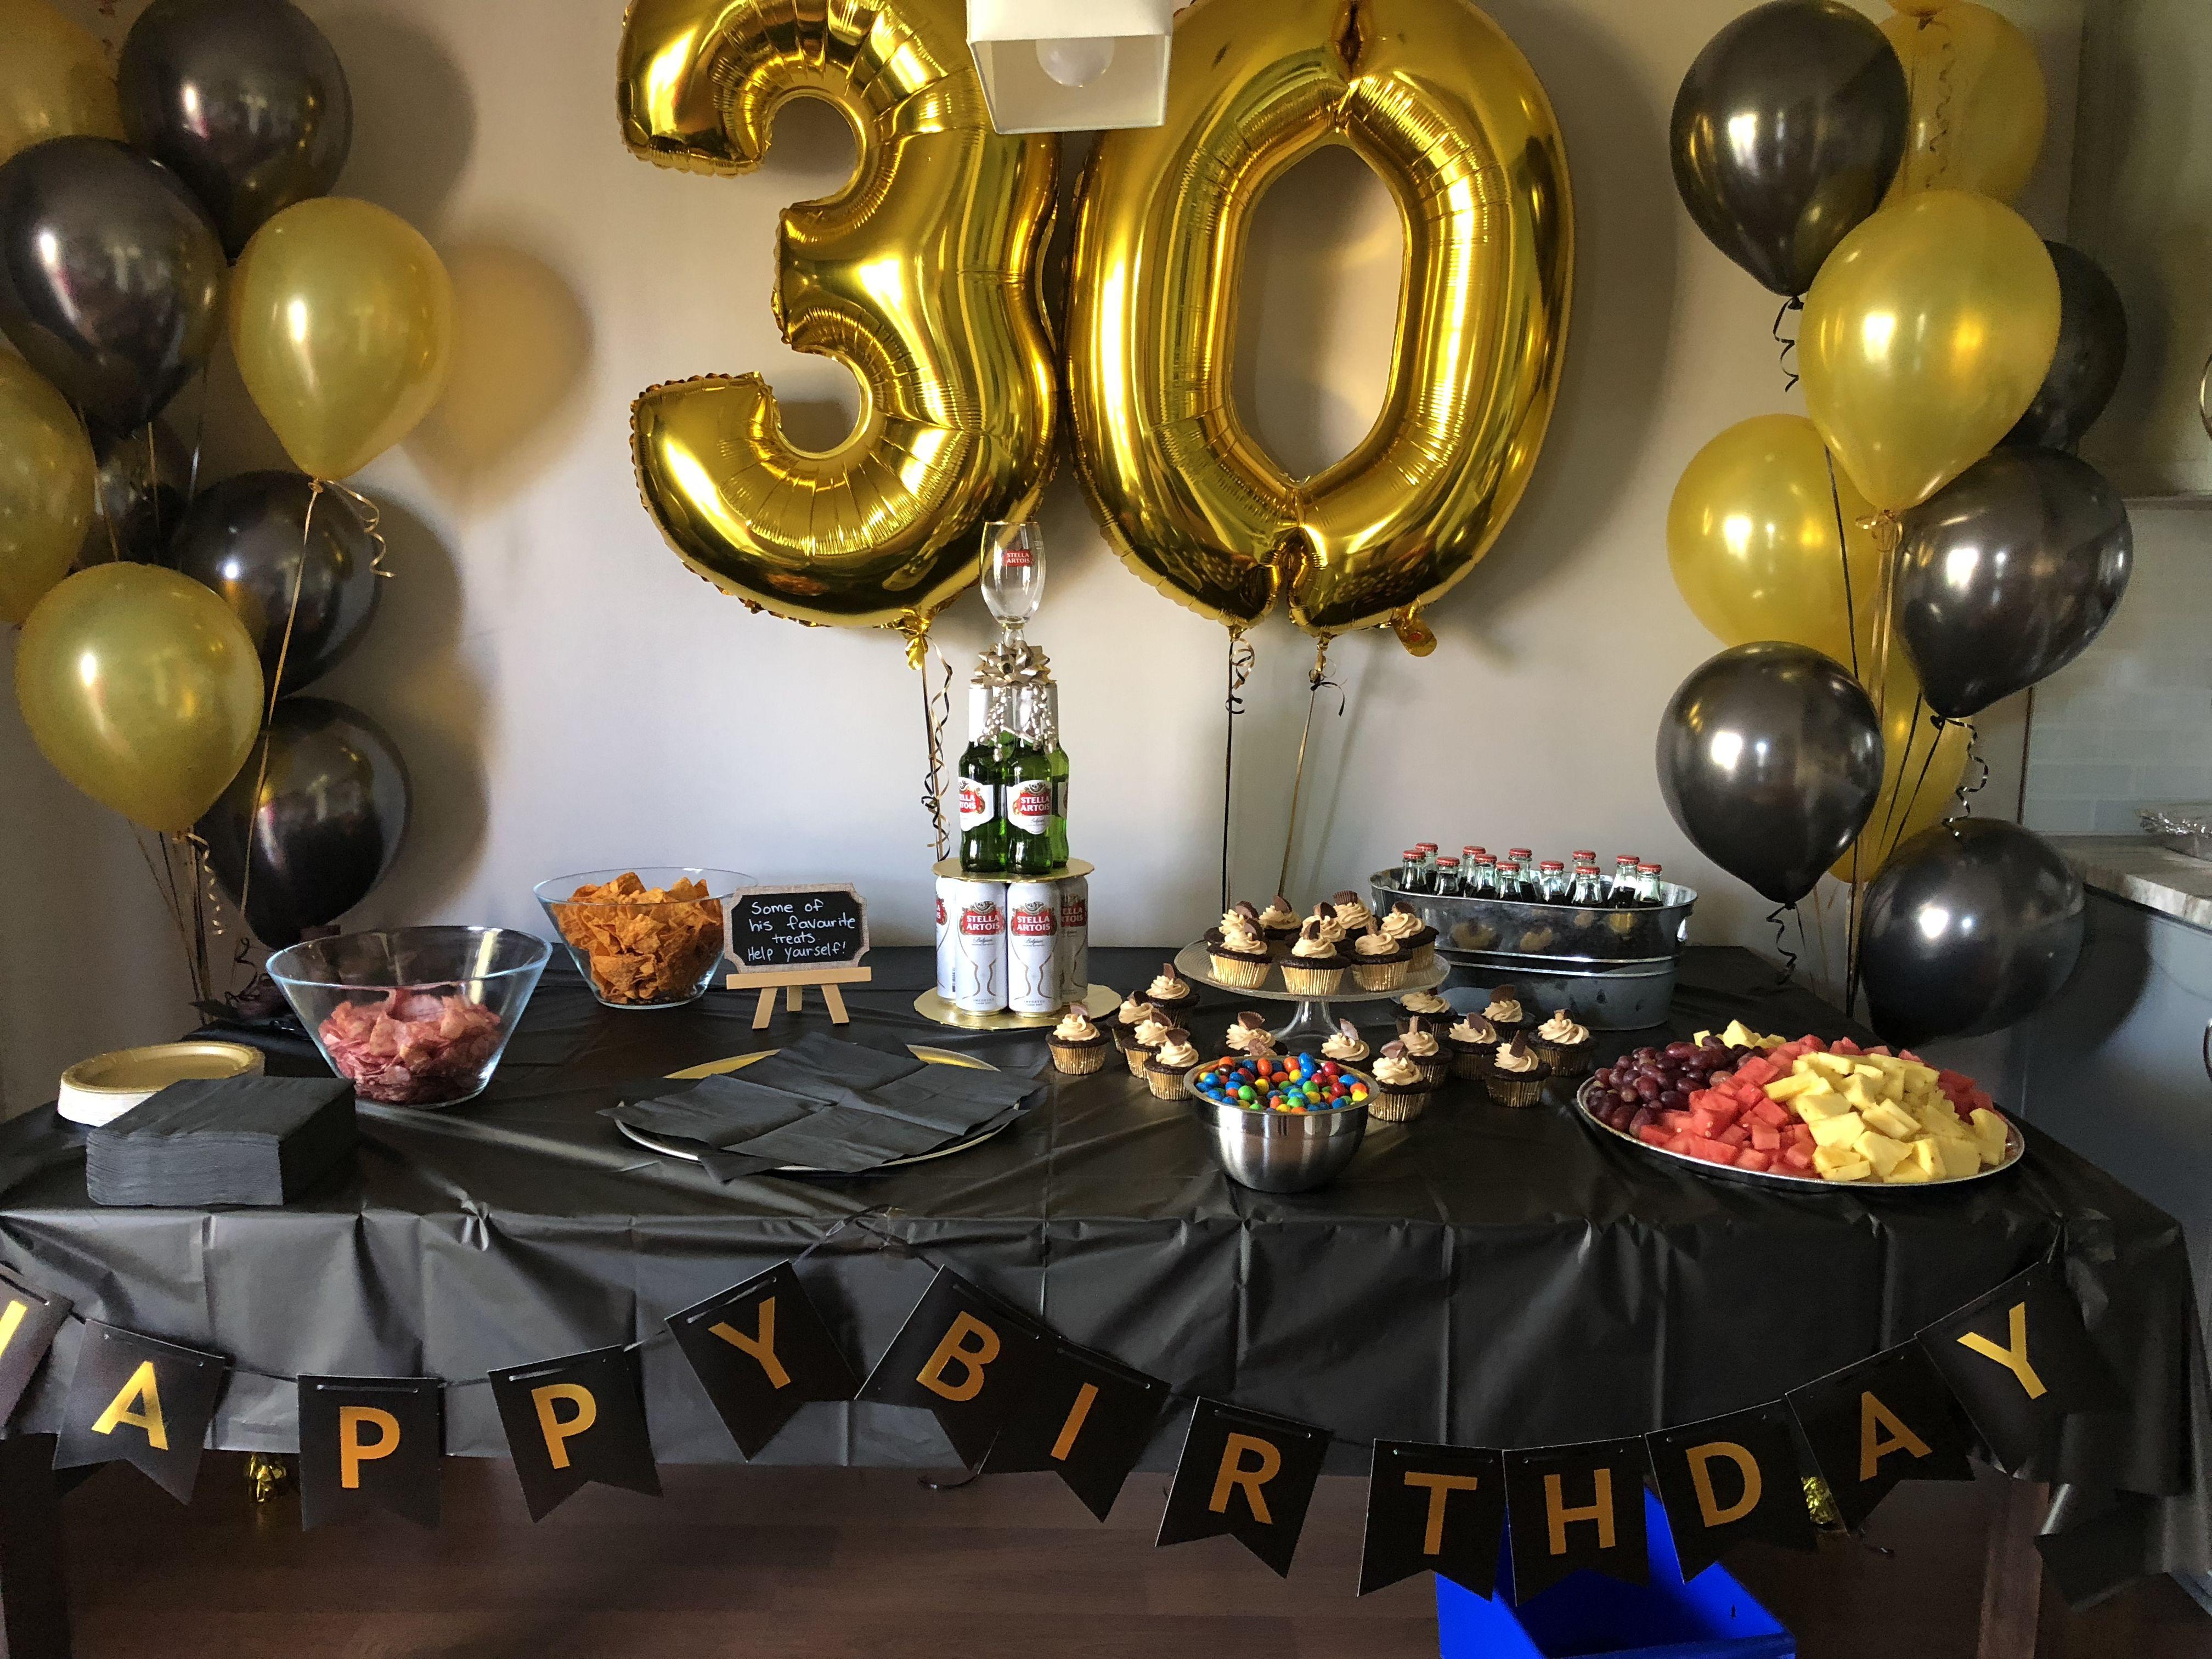 30th birthday decor for him 30th birthday decorations